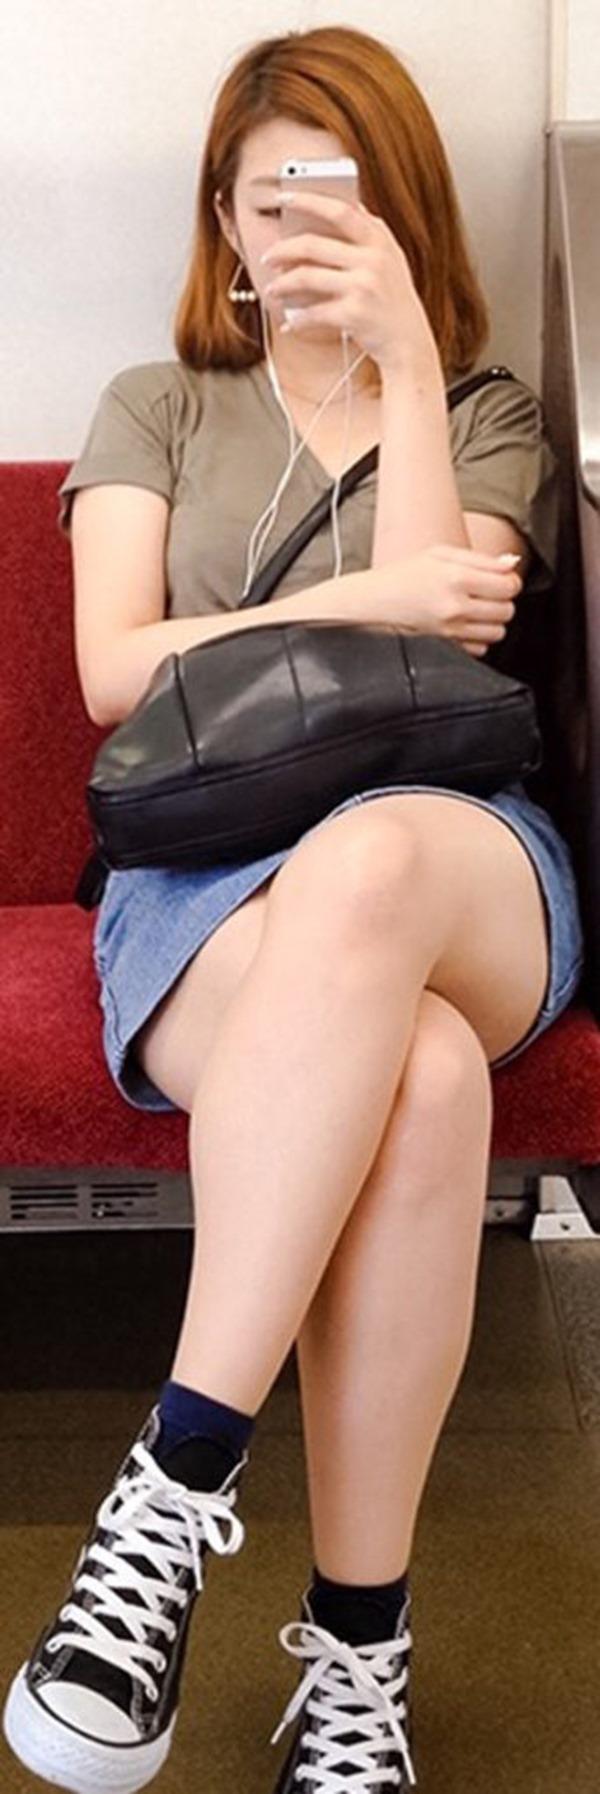 電車内生足2